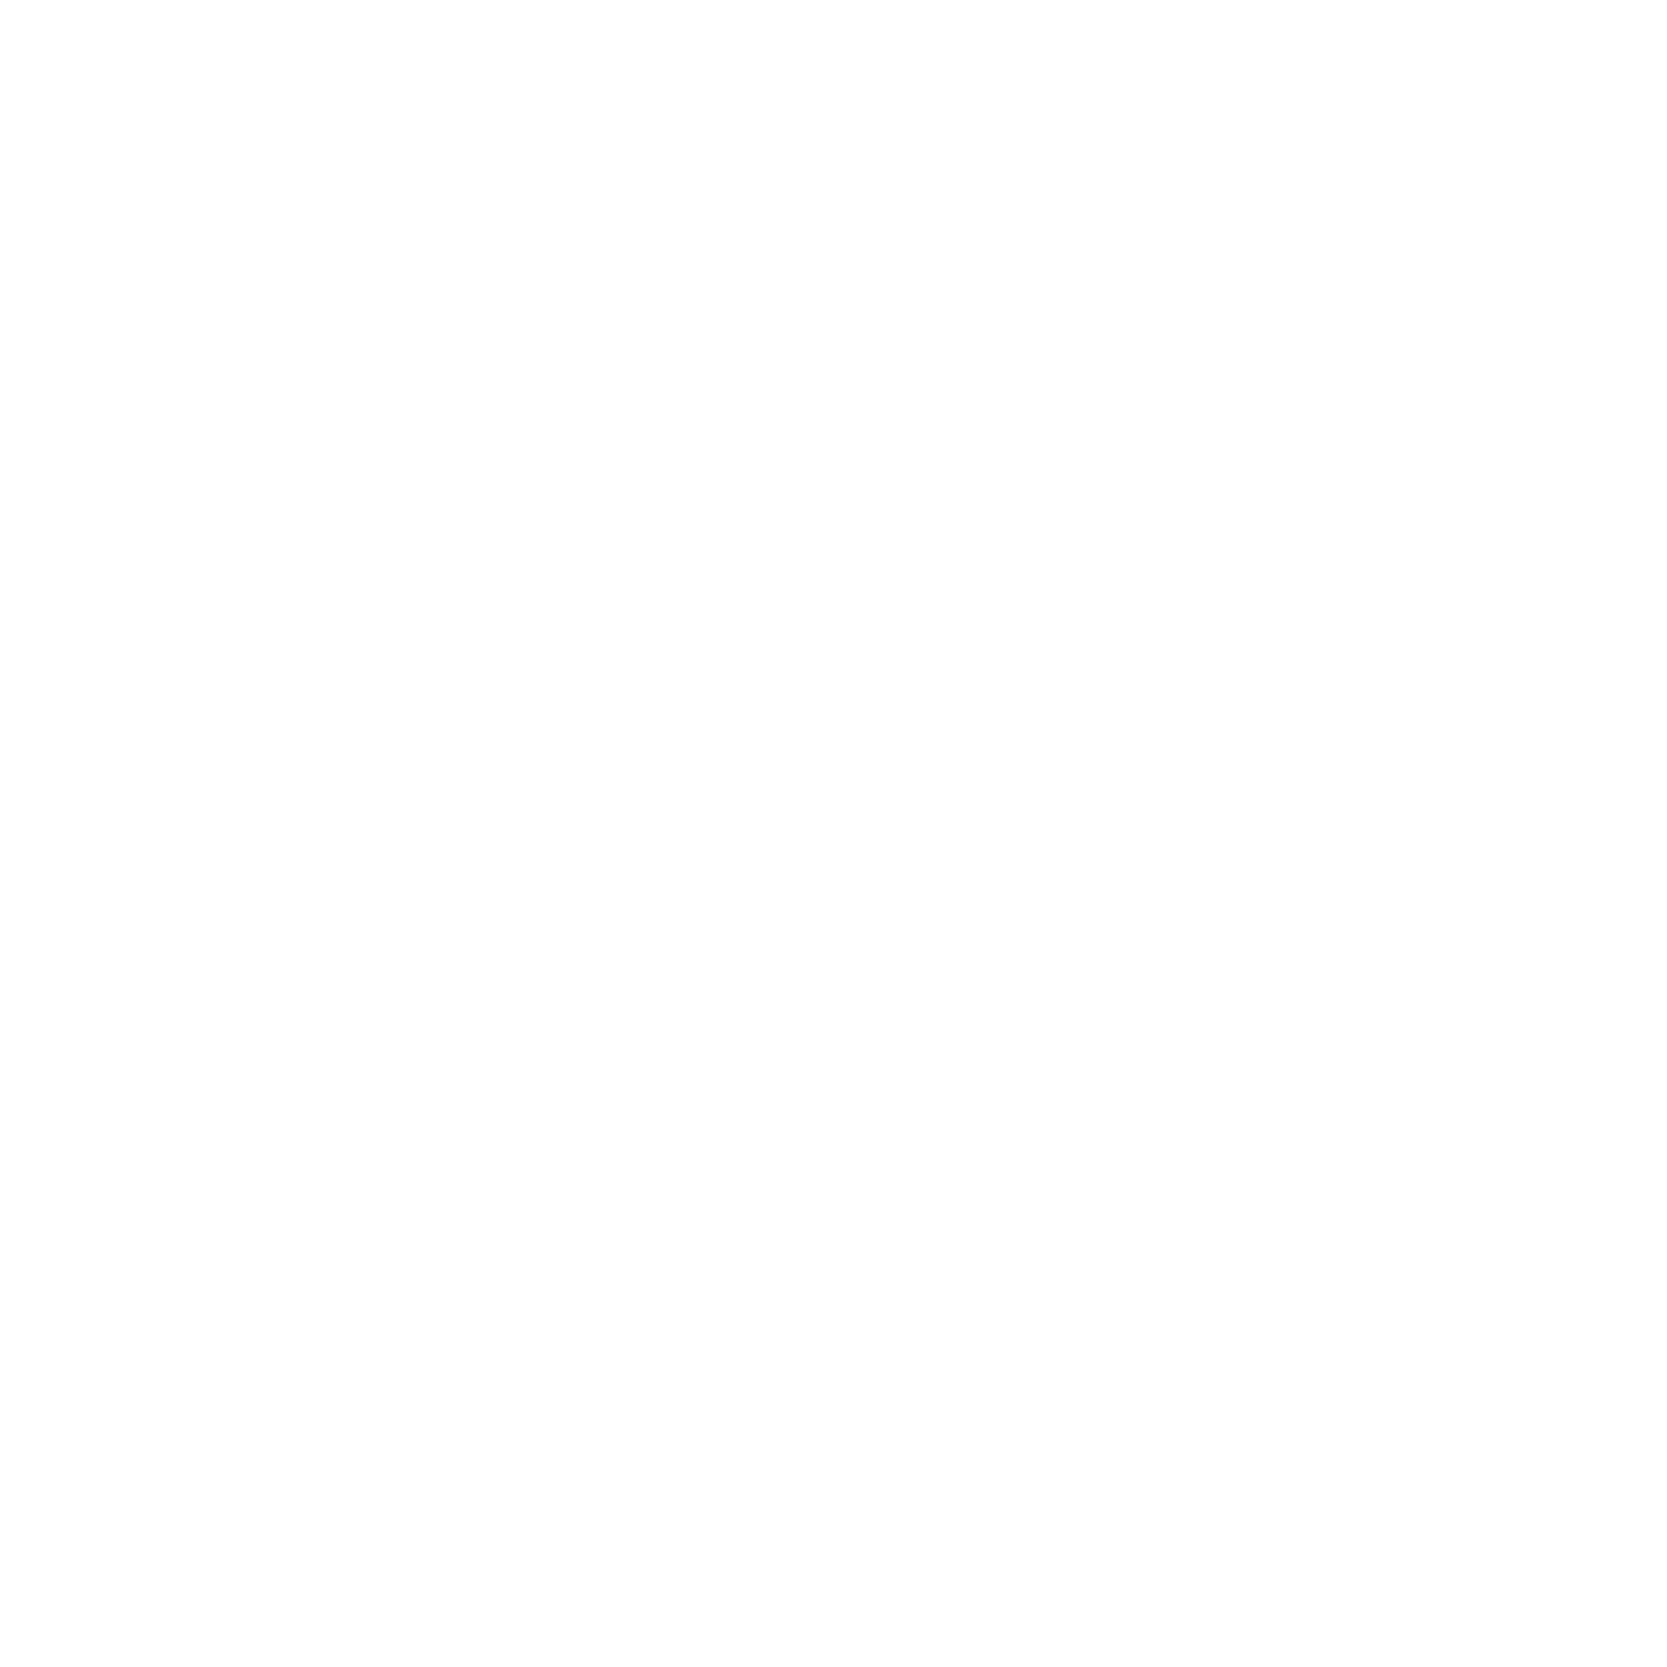 WJHS Theatre